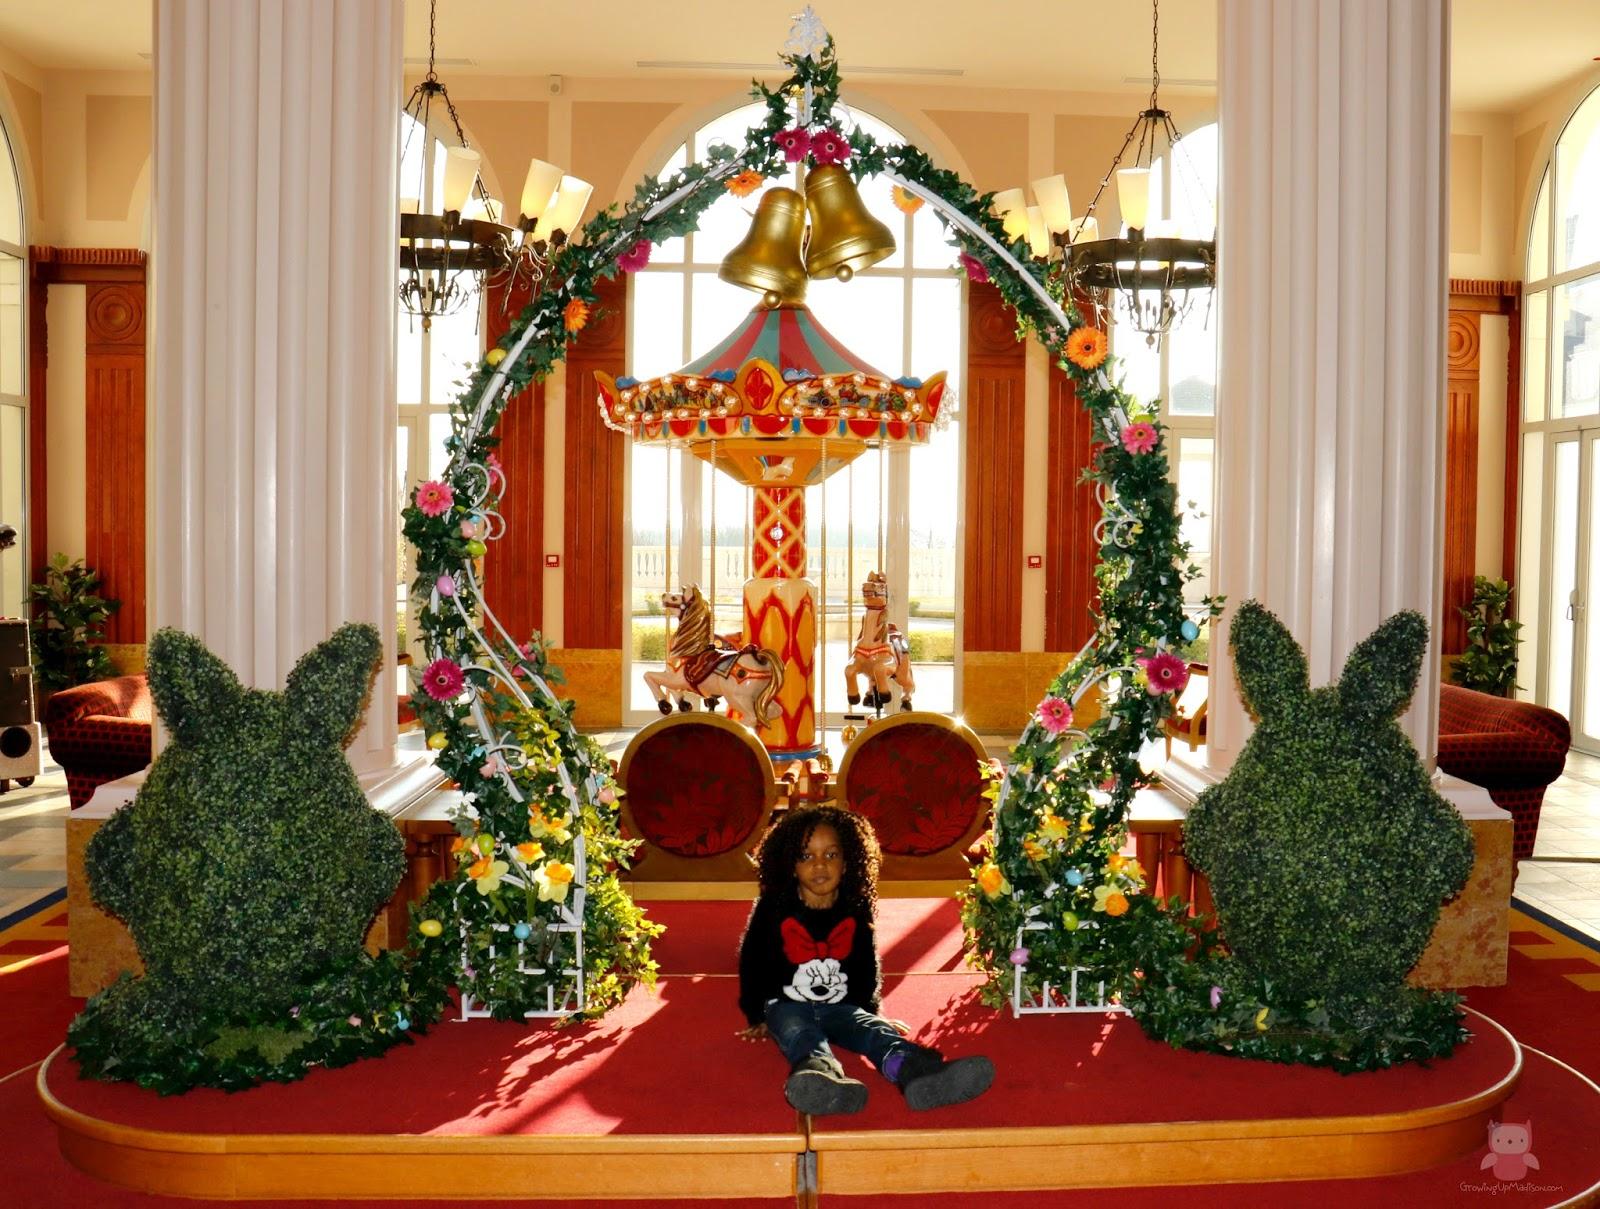 Why We Chose The Vienna House Dream Castle At Disneyland Paris